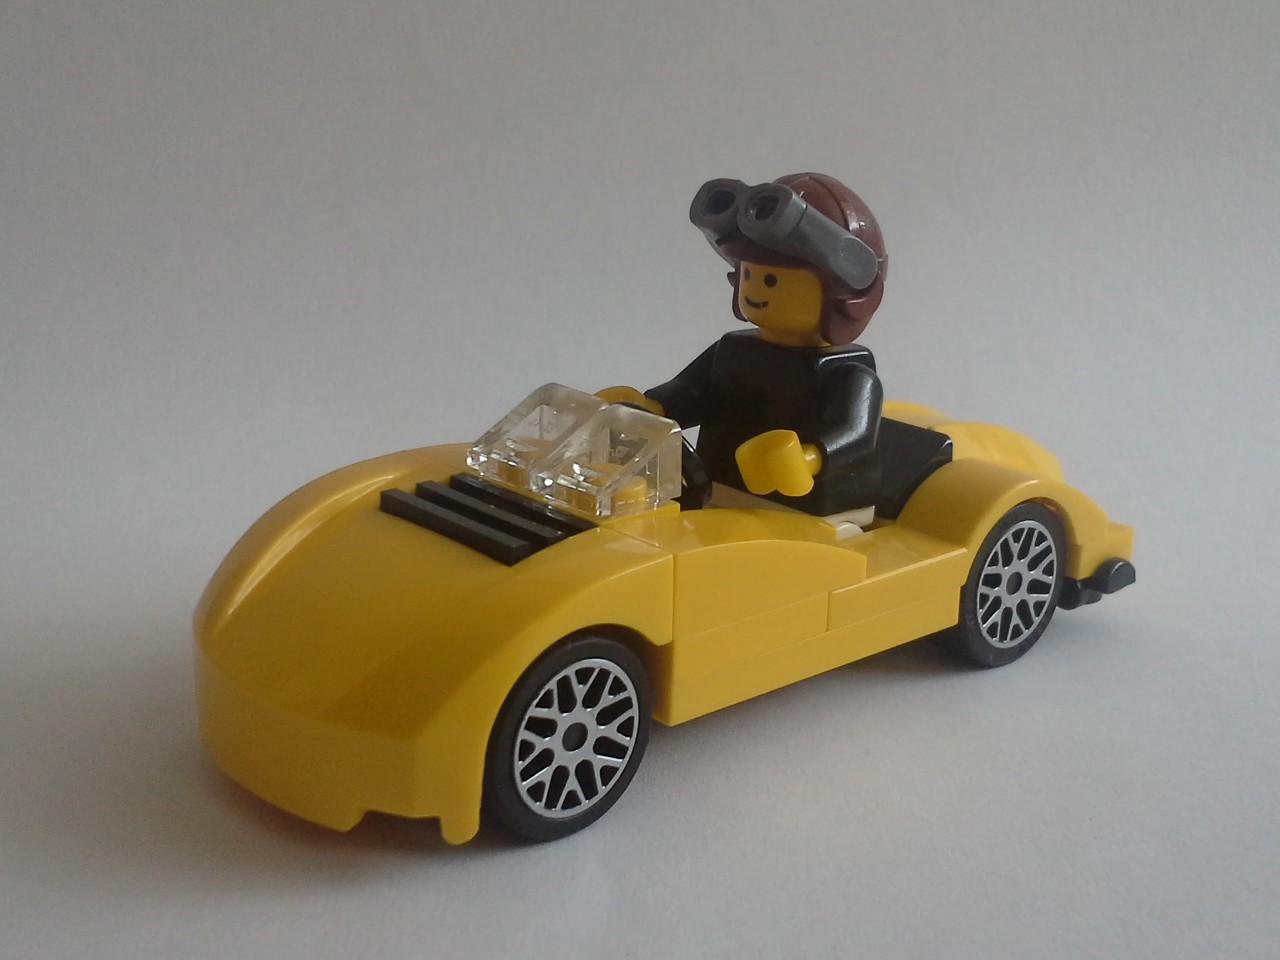 Long live the 4-stud wide [MOC] - LEGO Town - Eurobricks Forums